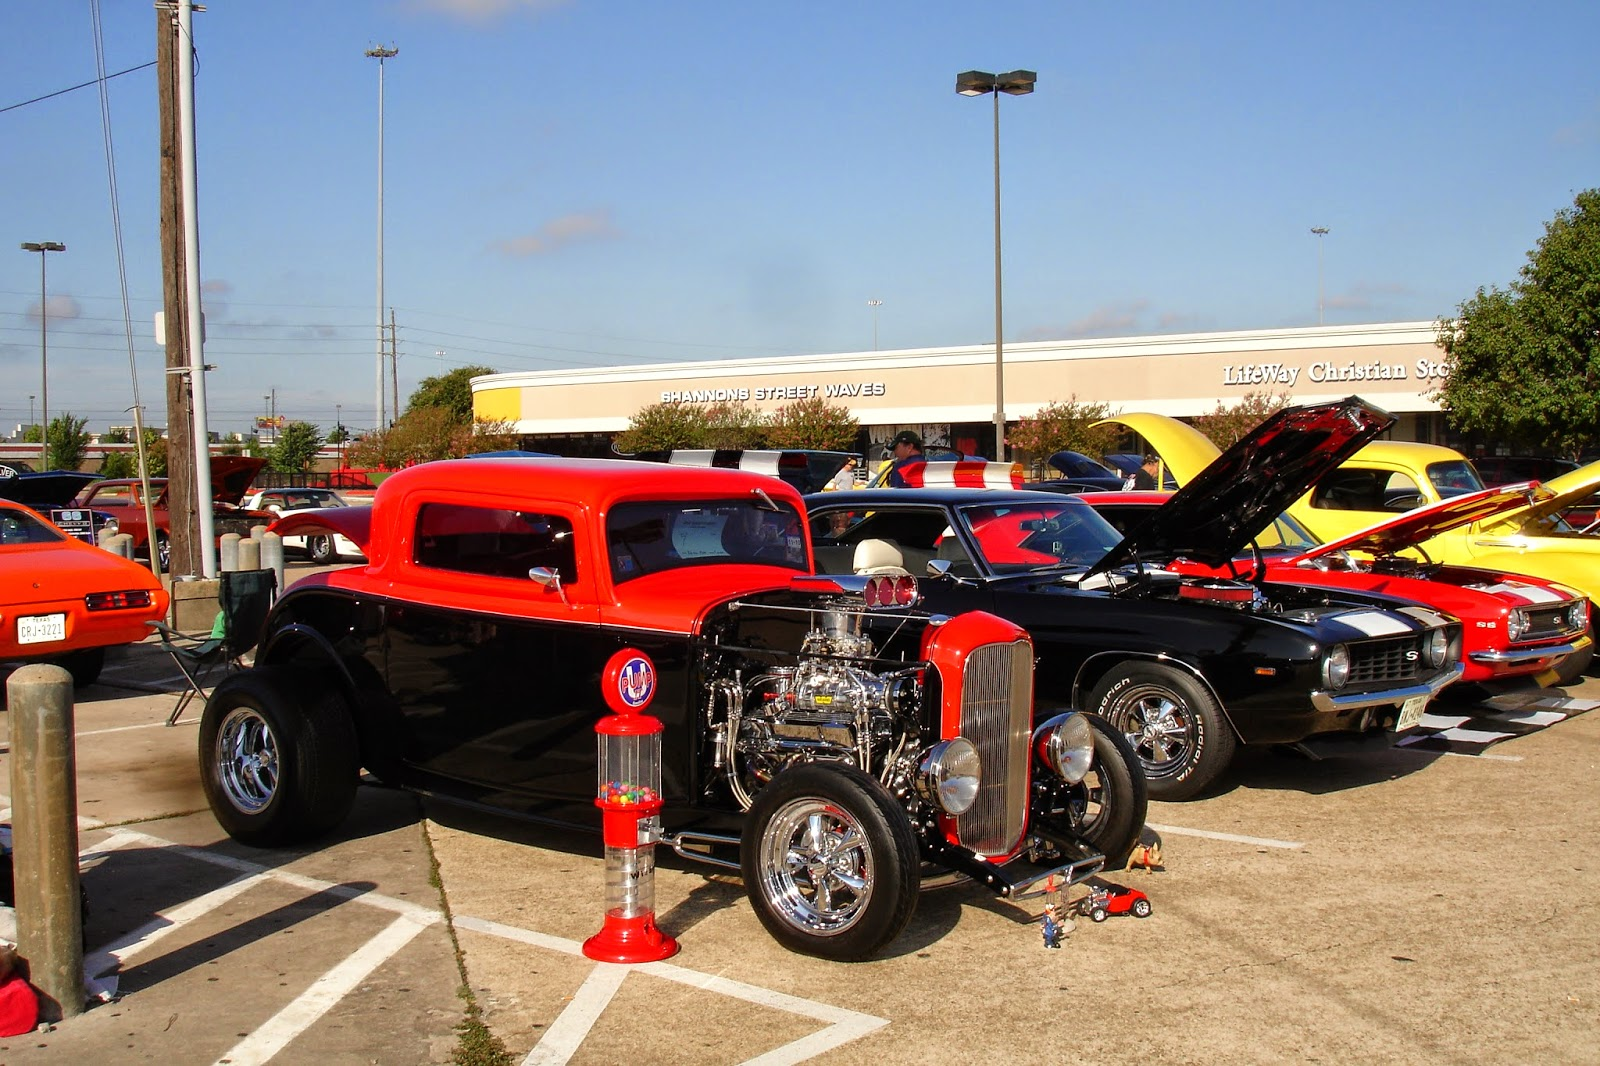 North Houston Krewzers September 2014